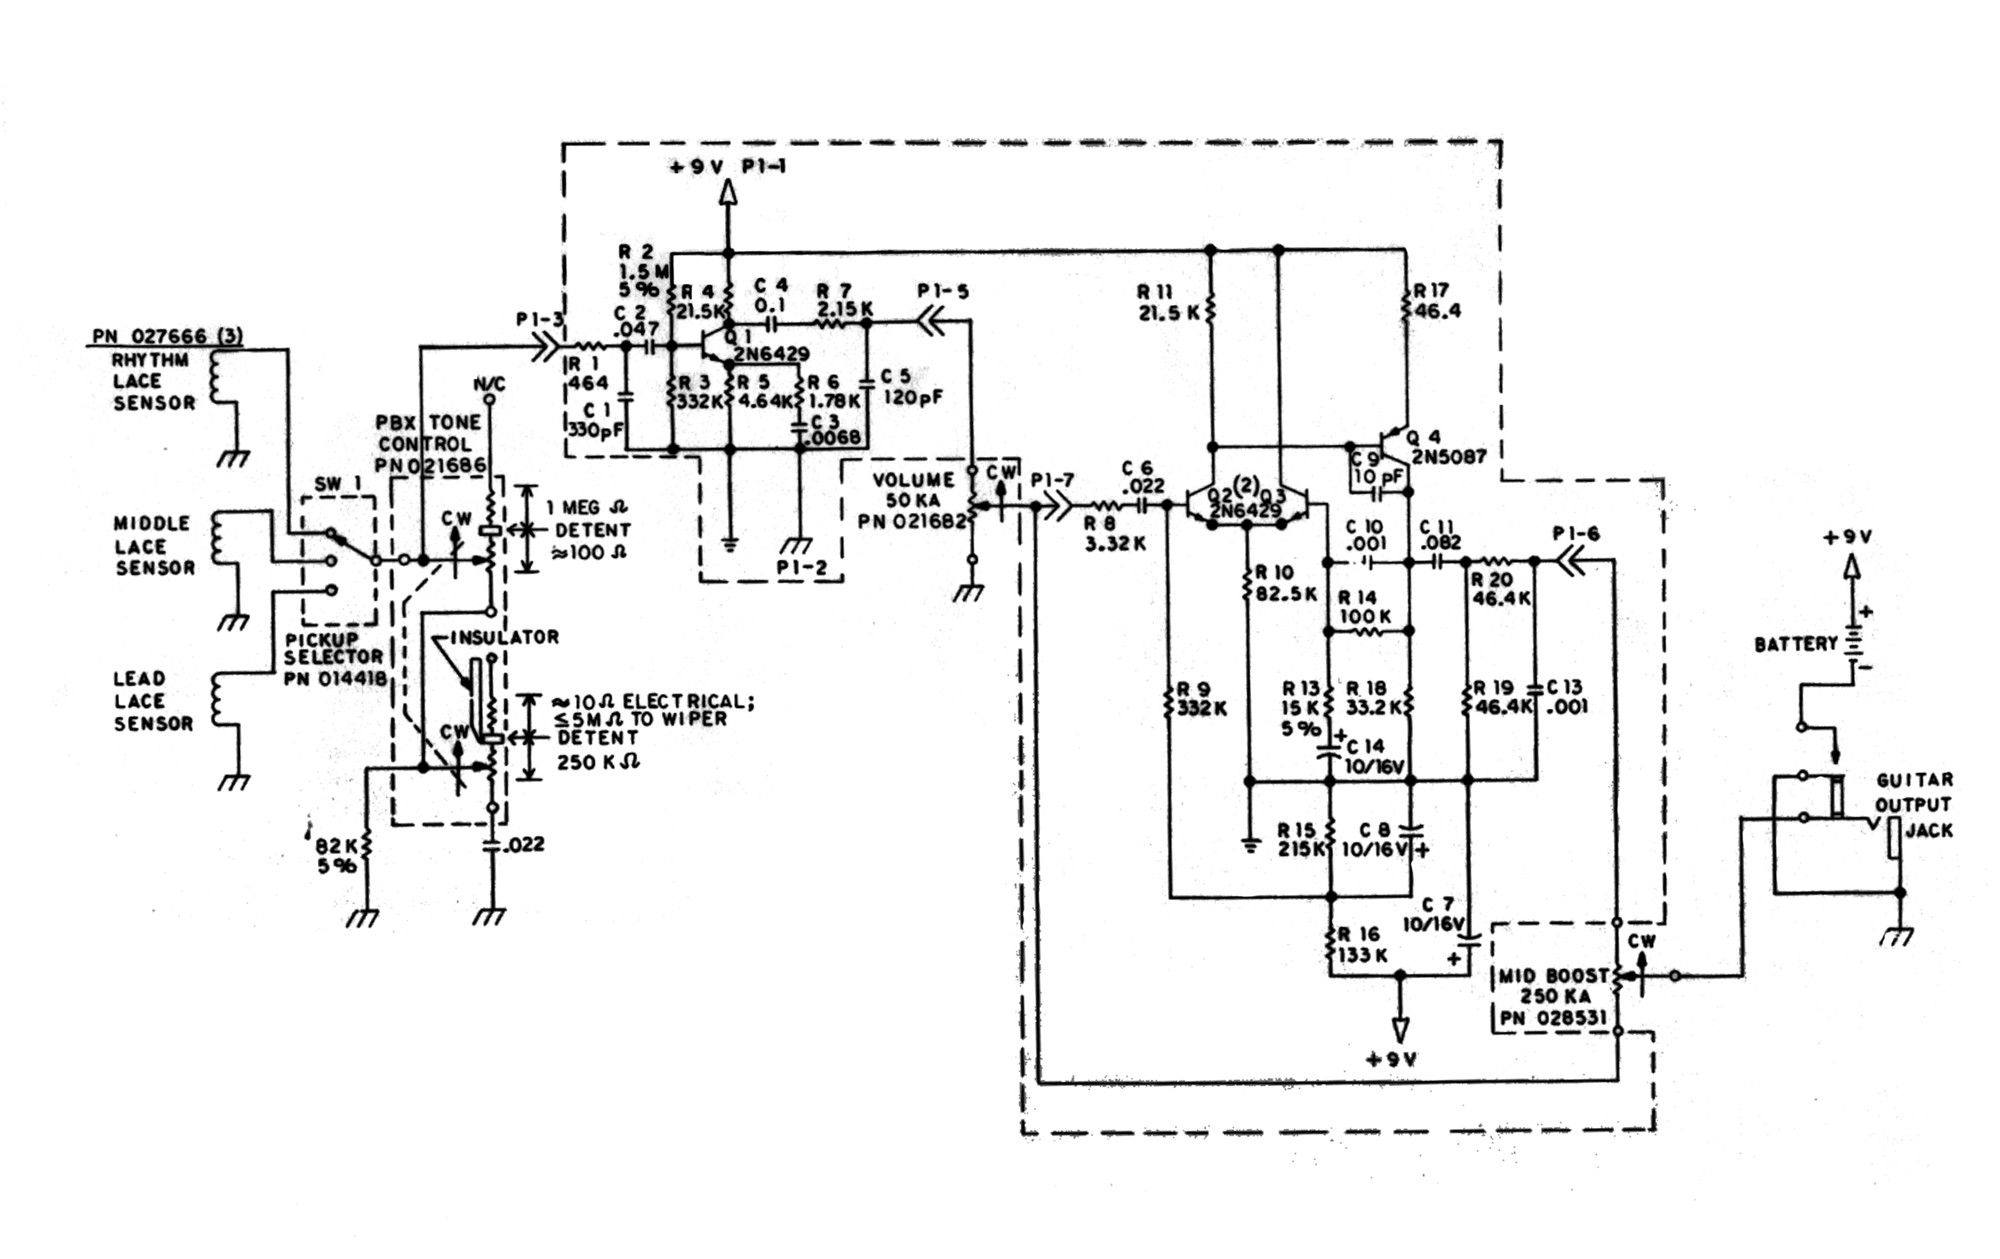 [SCHEMATICS_44OR]  BS_2813] 74 Fender Jazz B Wiring Diagram | Fender Noiseless Jazz Bass Wiring Diagram |  | Lave Benkeme Arnes Tzici Ungo Awni Eopsy Peted Oidei Vira Mohammedshrine  Librar Wiring 101